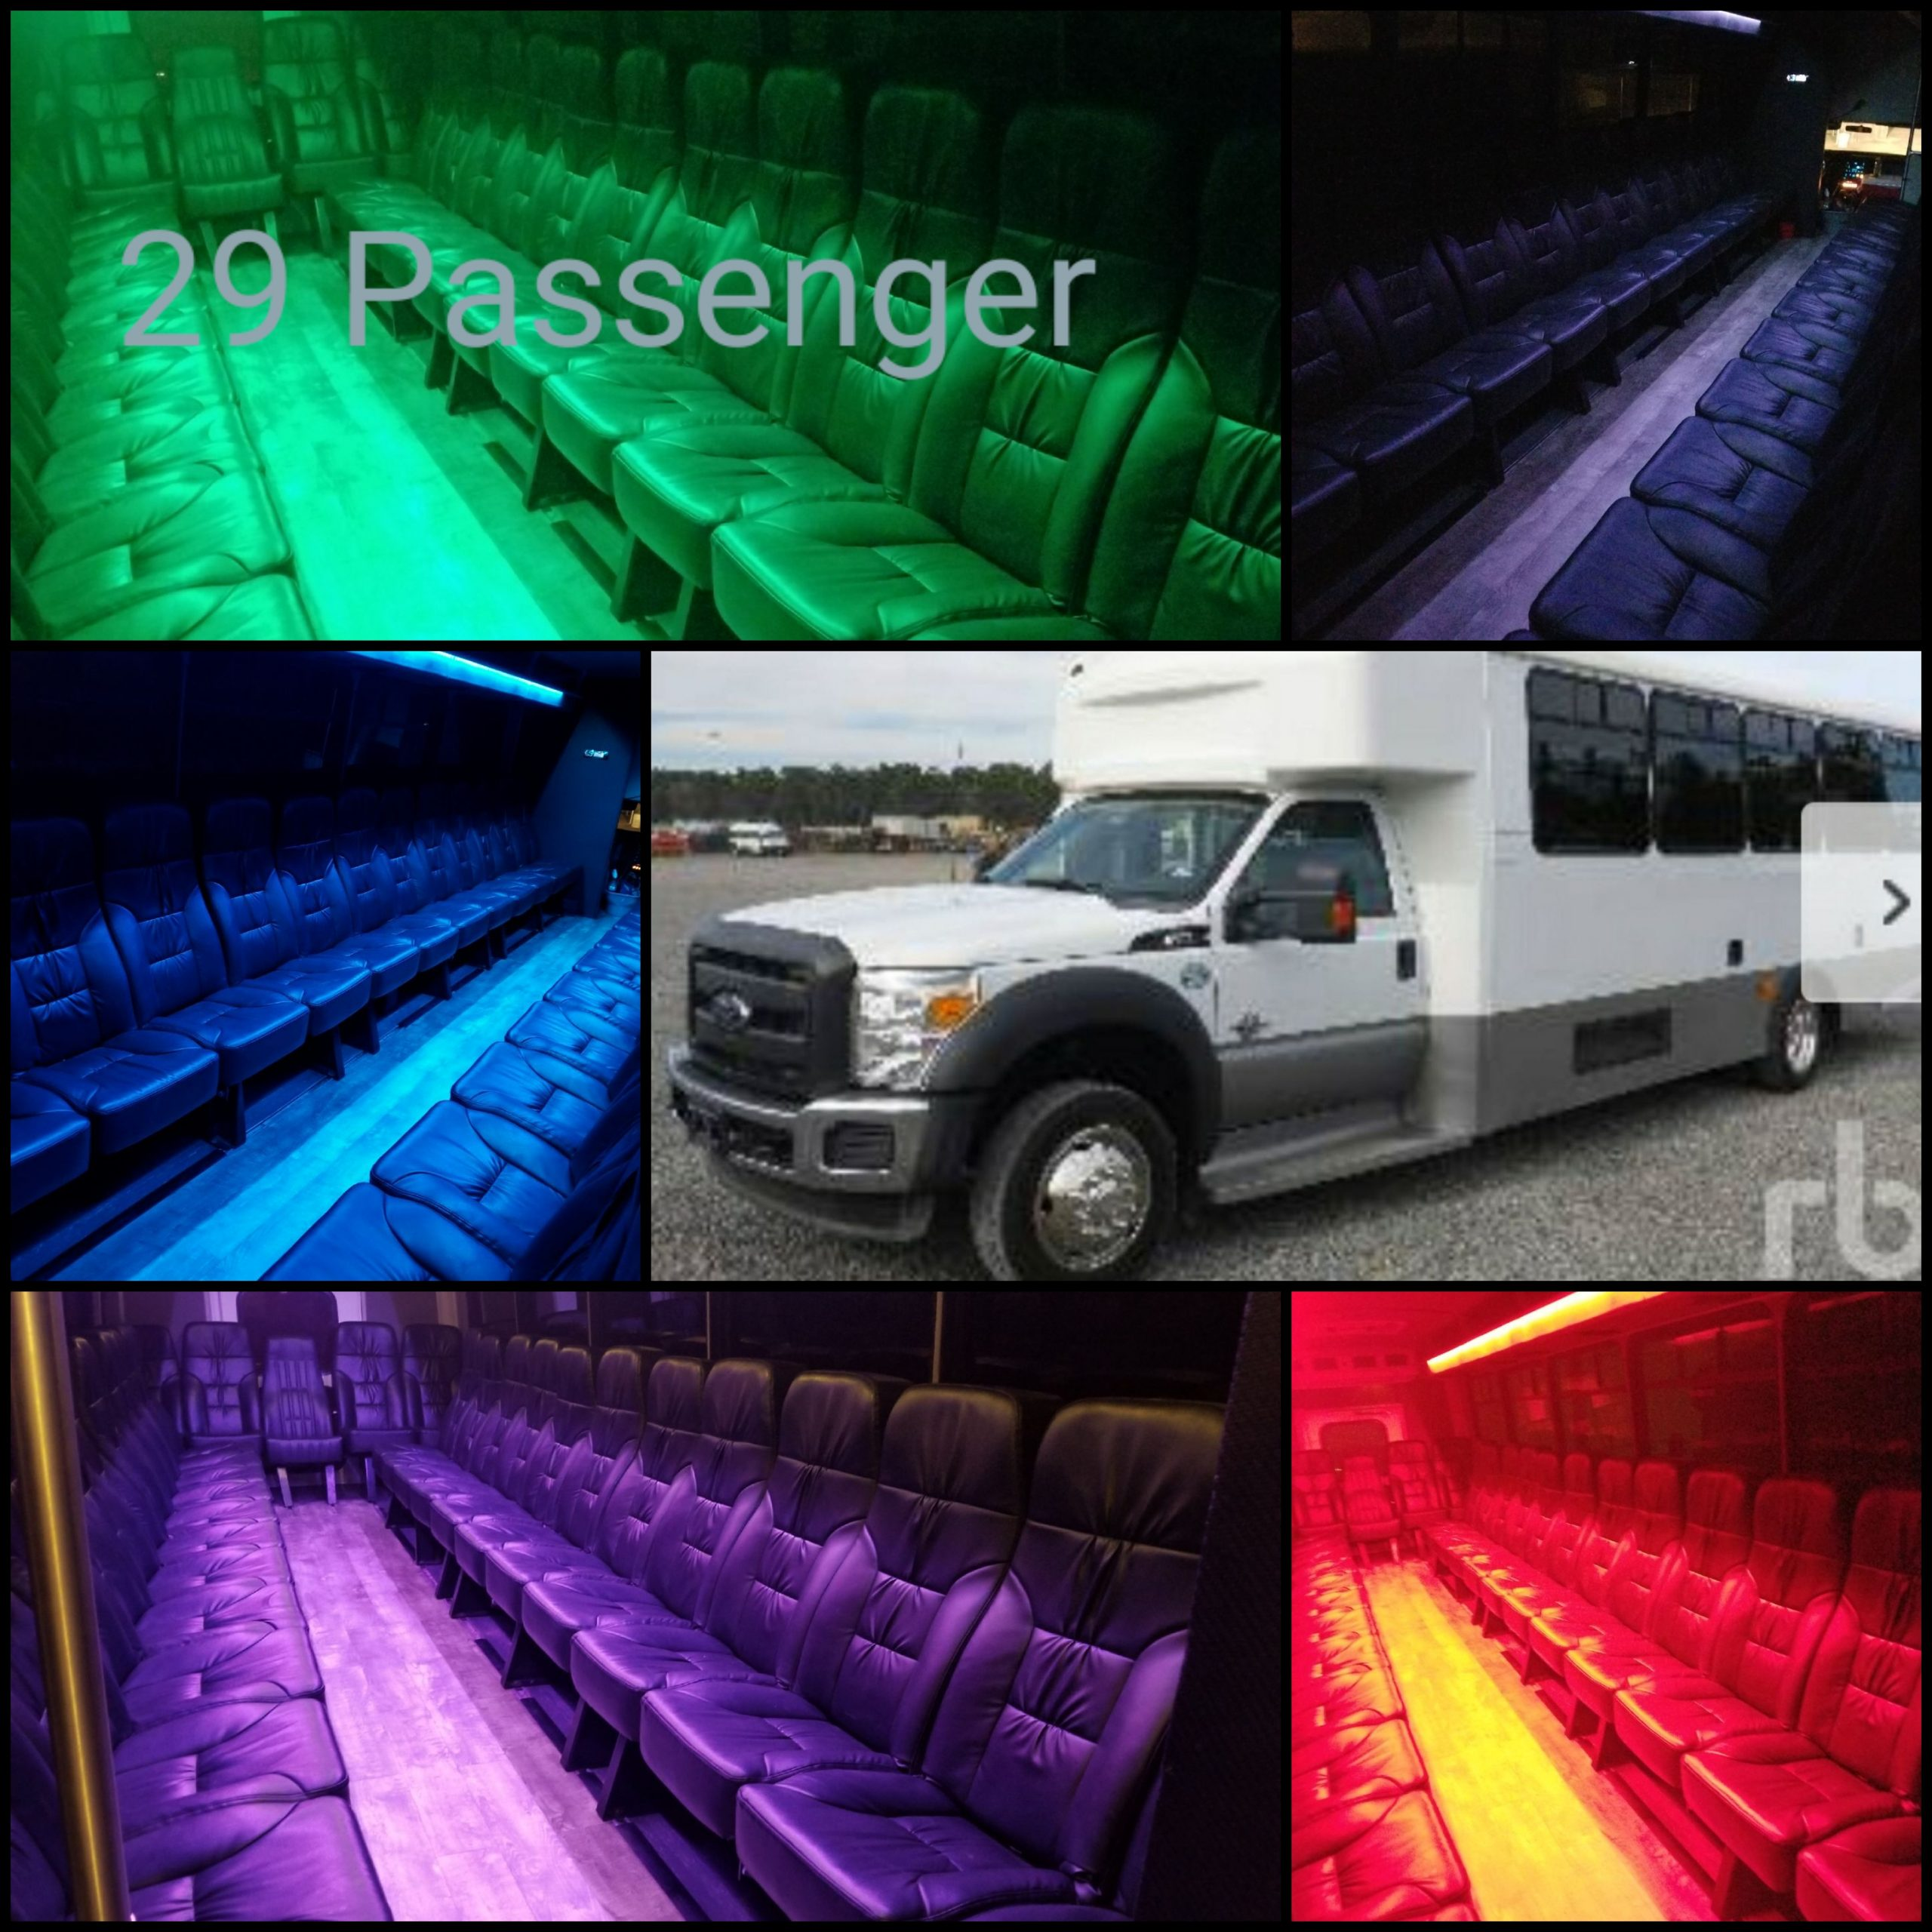 26-28 passenger